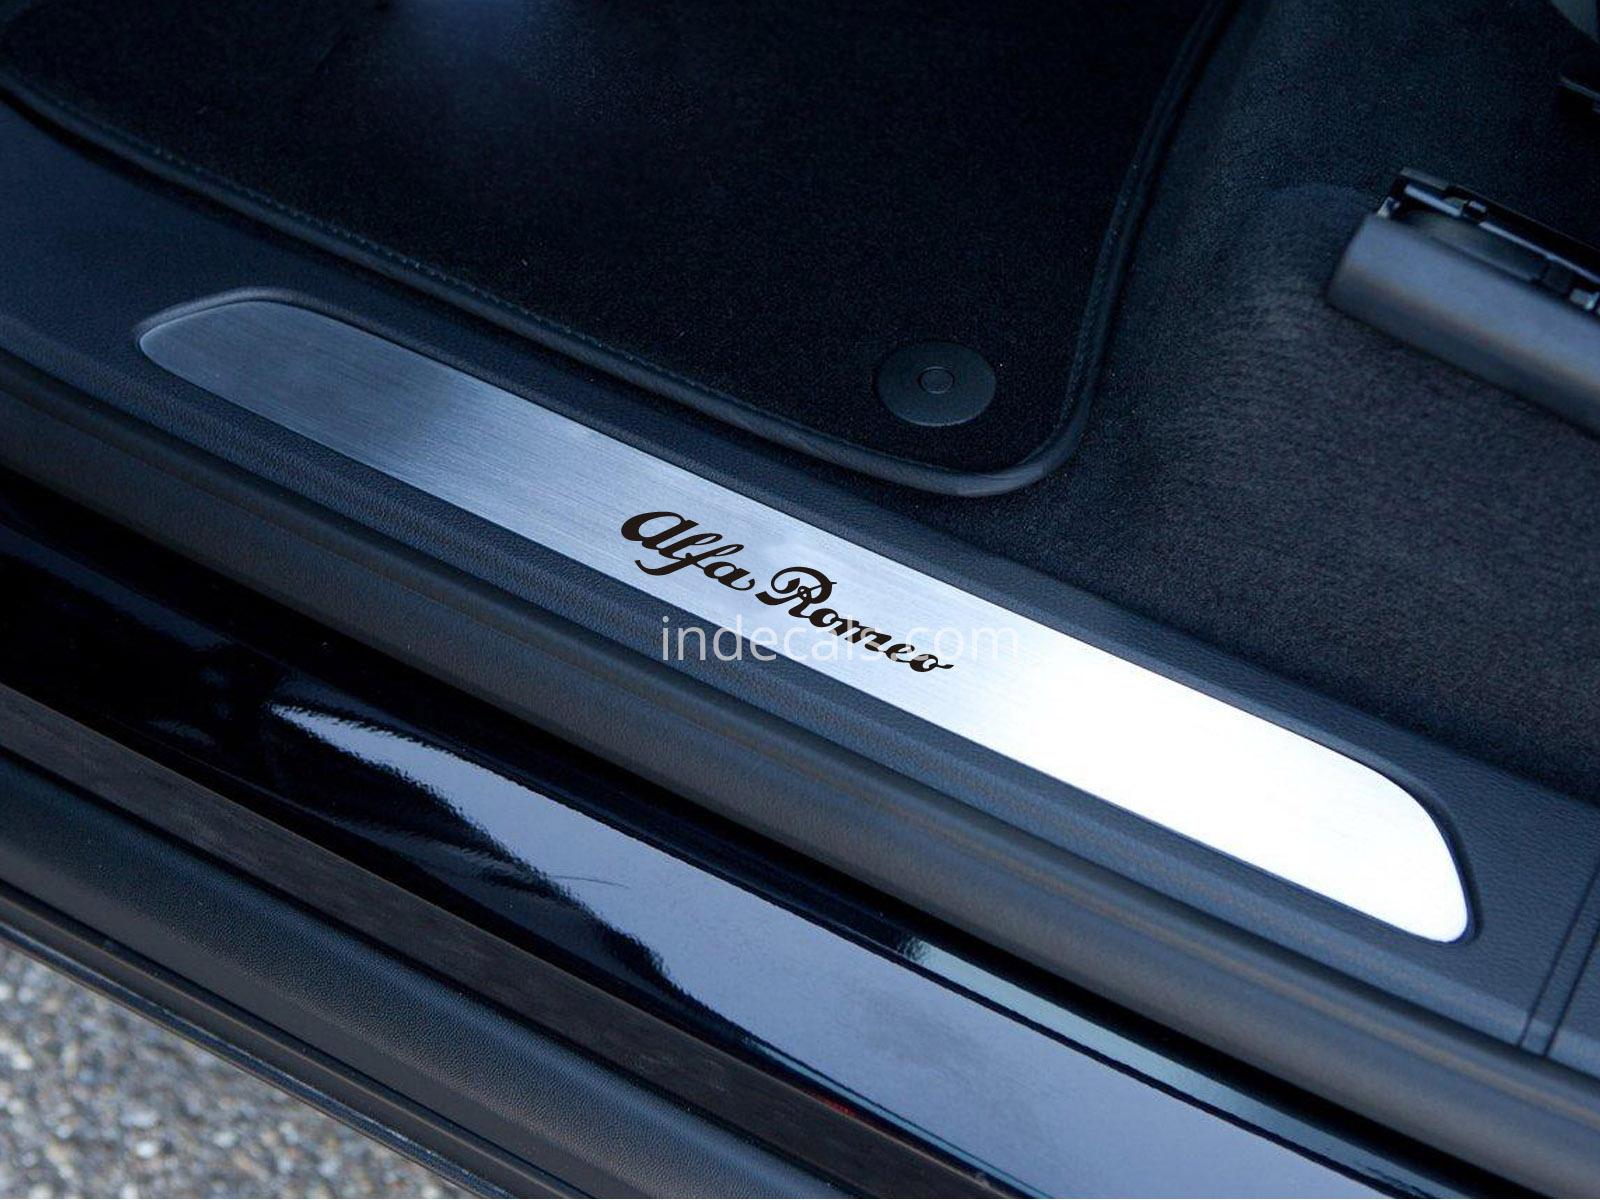 1 X Alfa Romeo Sticker For Windshield Or Back Window Black